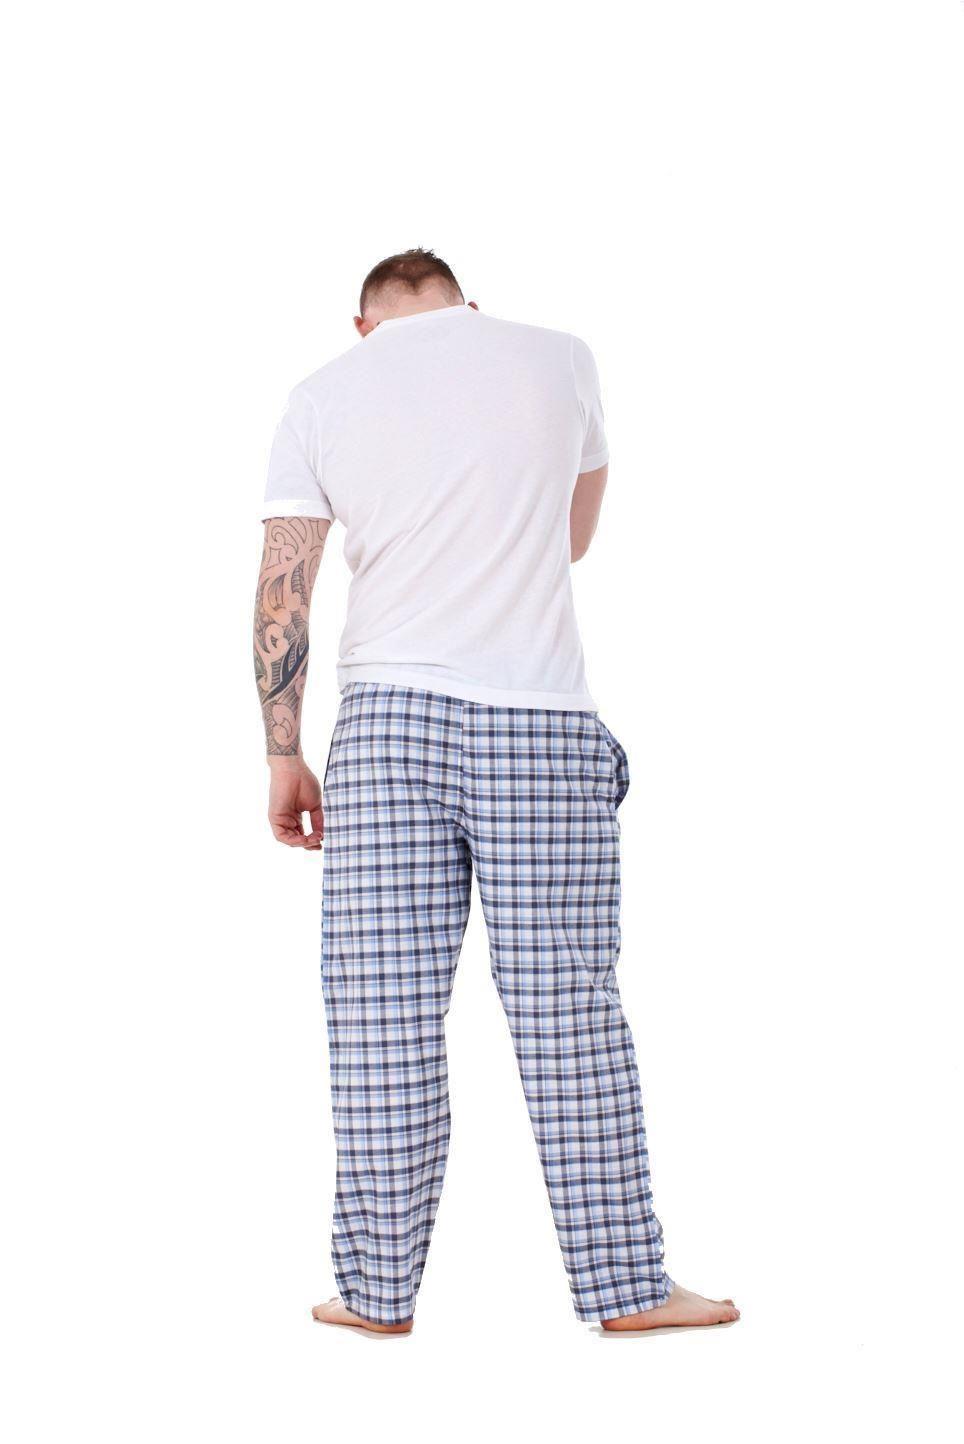 Mens-Pyjama-Bottoms-Rich-Cotton-Woven-Check-Lounge-Pant-Nightwear-Big-3XL-to-5XL Indexbild 65